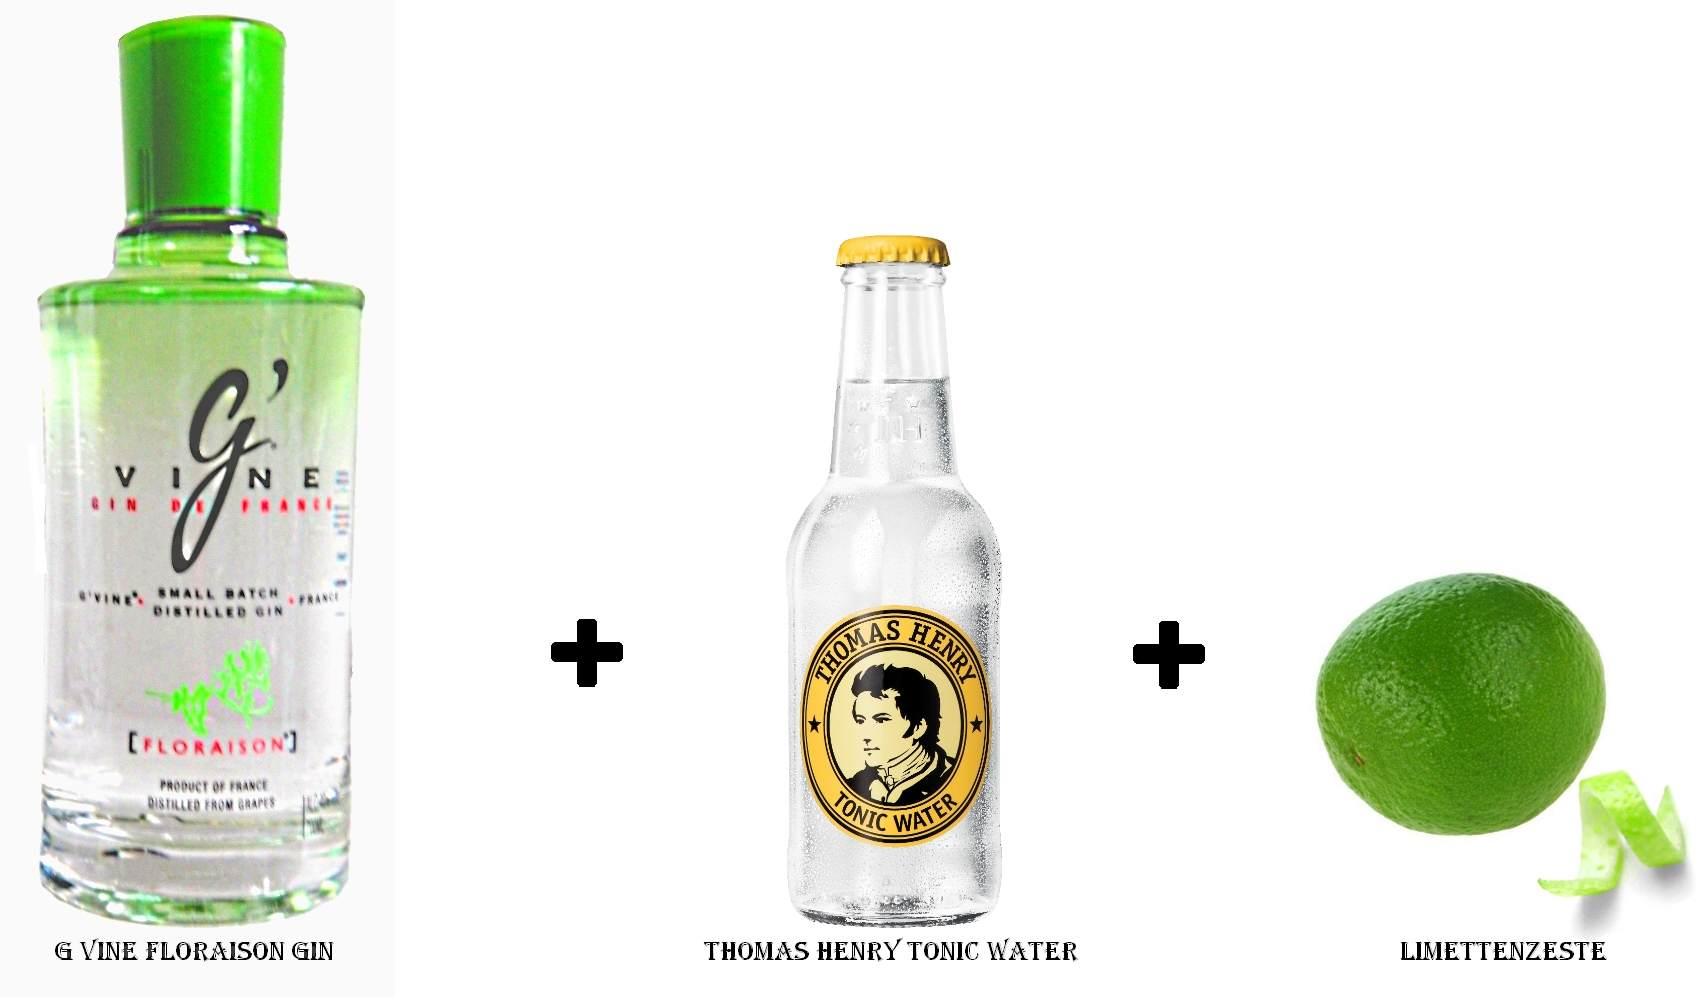 G Vine Floraison Gin + Thomas Henry Tonic Water + Limettenzeste